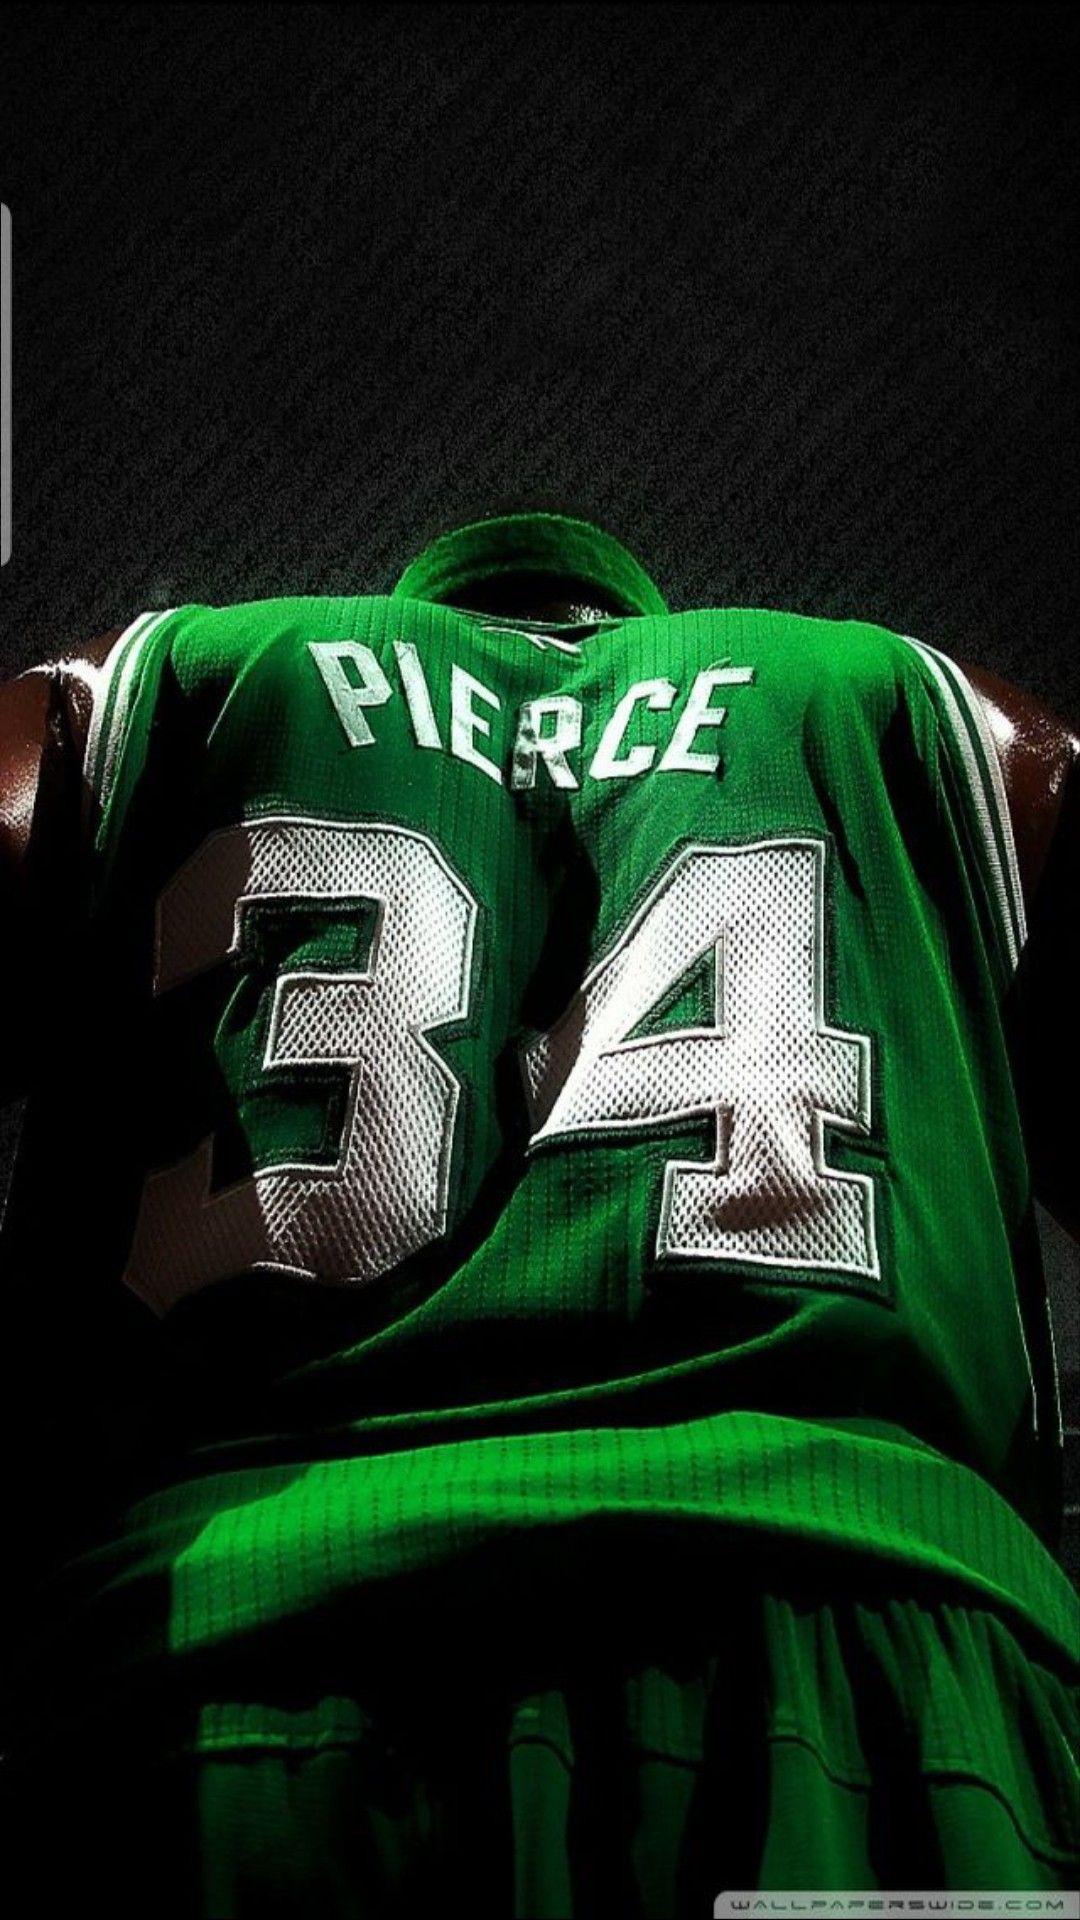 Pin By Archie Douglas On Sportz Wallpaperz Boston Celtics